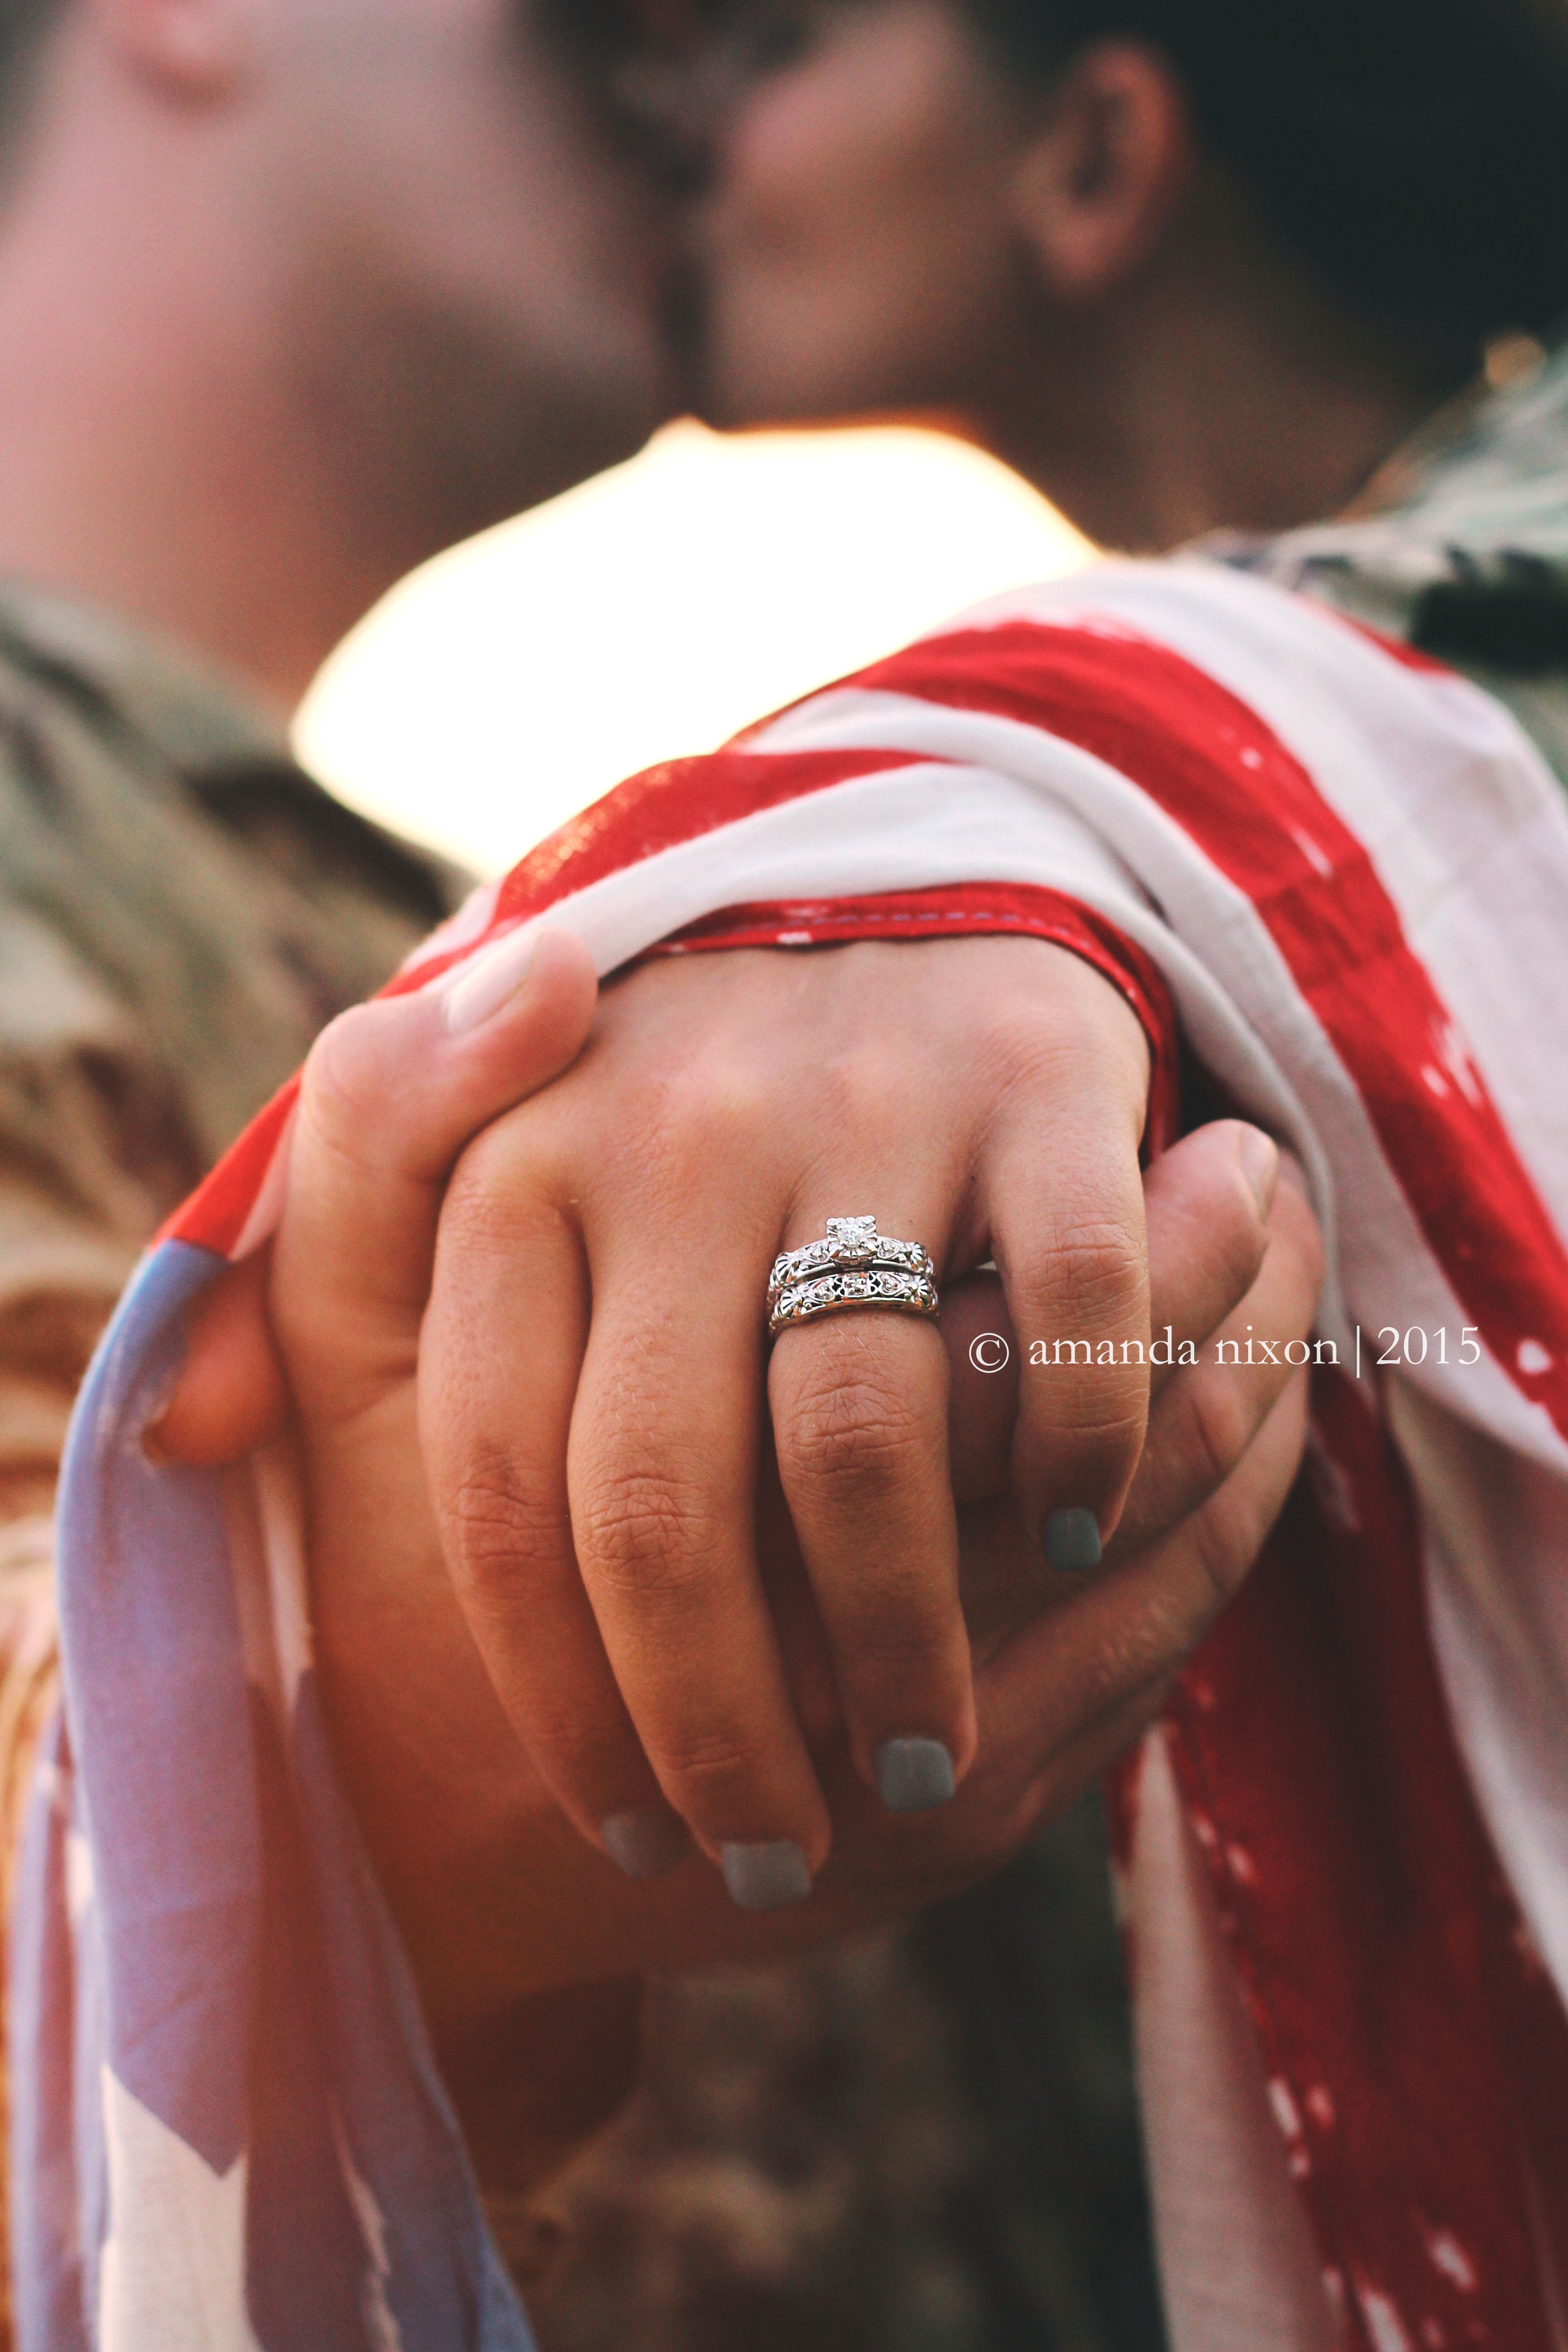 Dual Military Engagement Ring Photo Idea C Amanda Nixon Military Engagement Photos Military Wedding Army Wedding